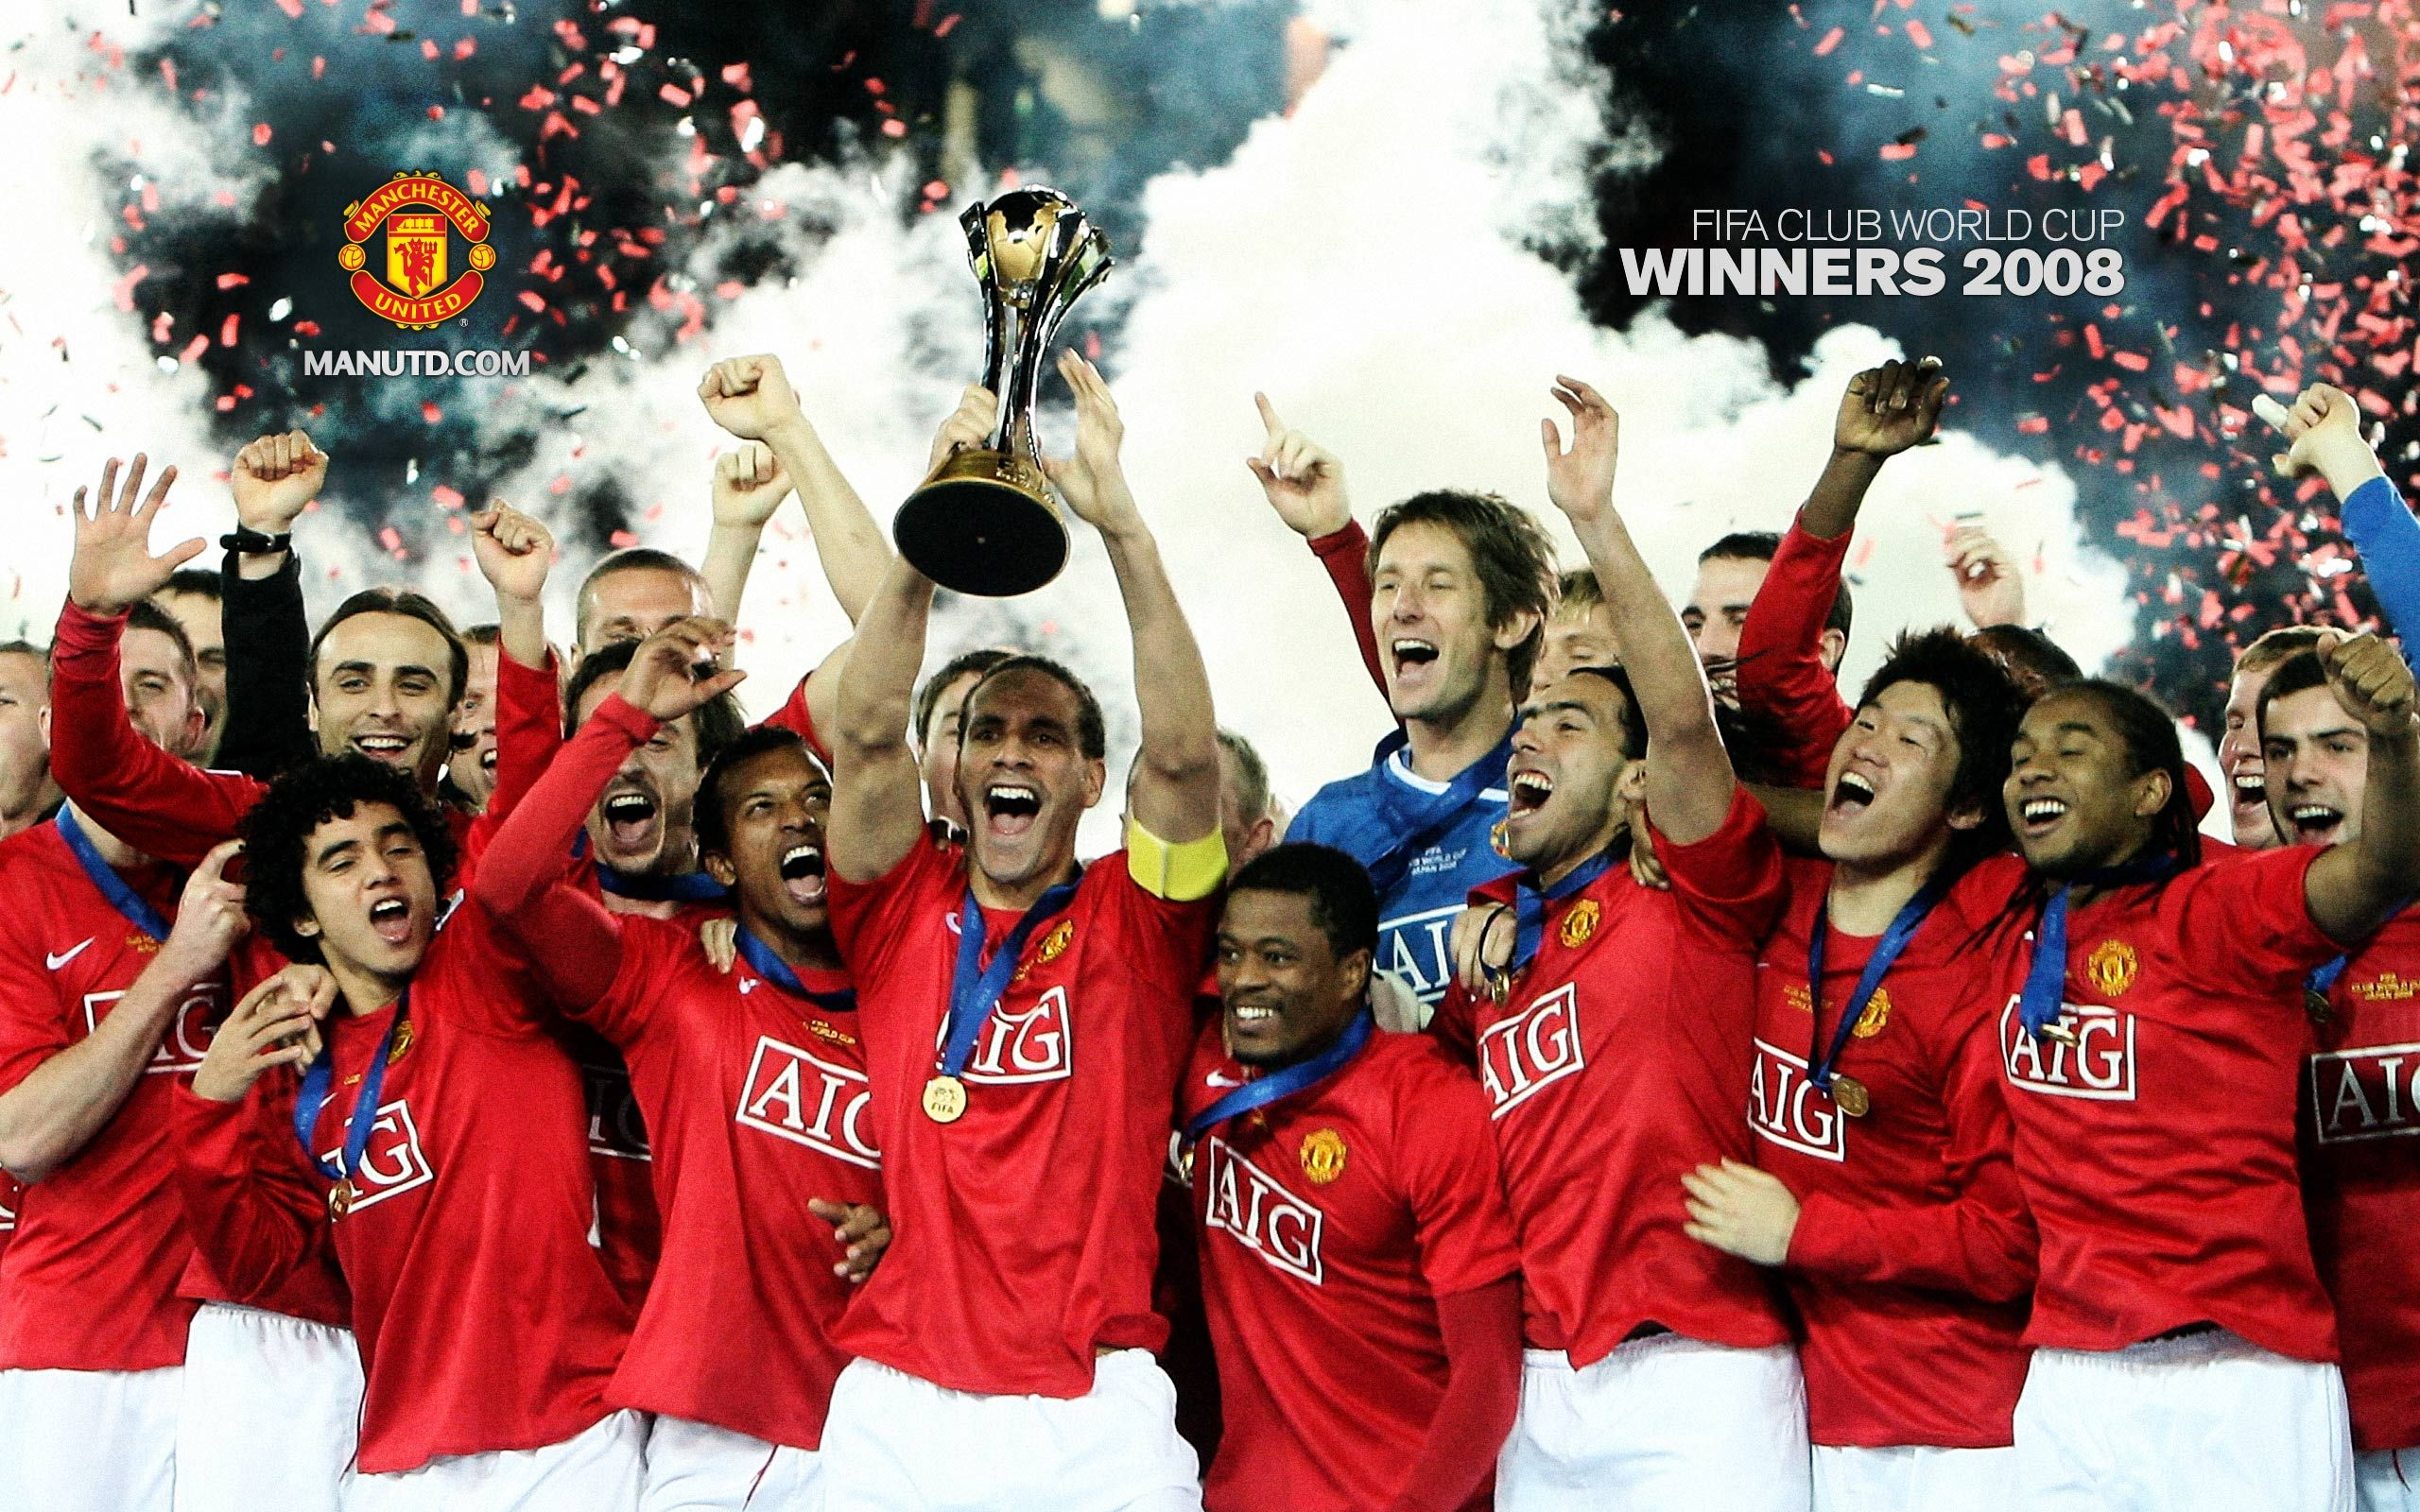 Club World Cup 2008 Winner Manchester united club